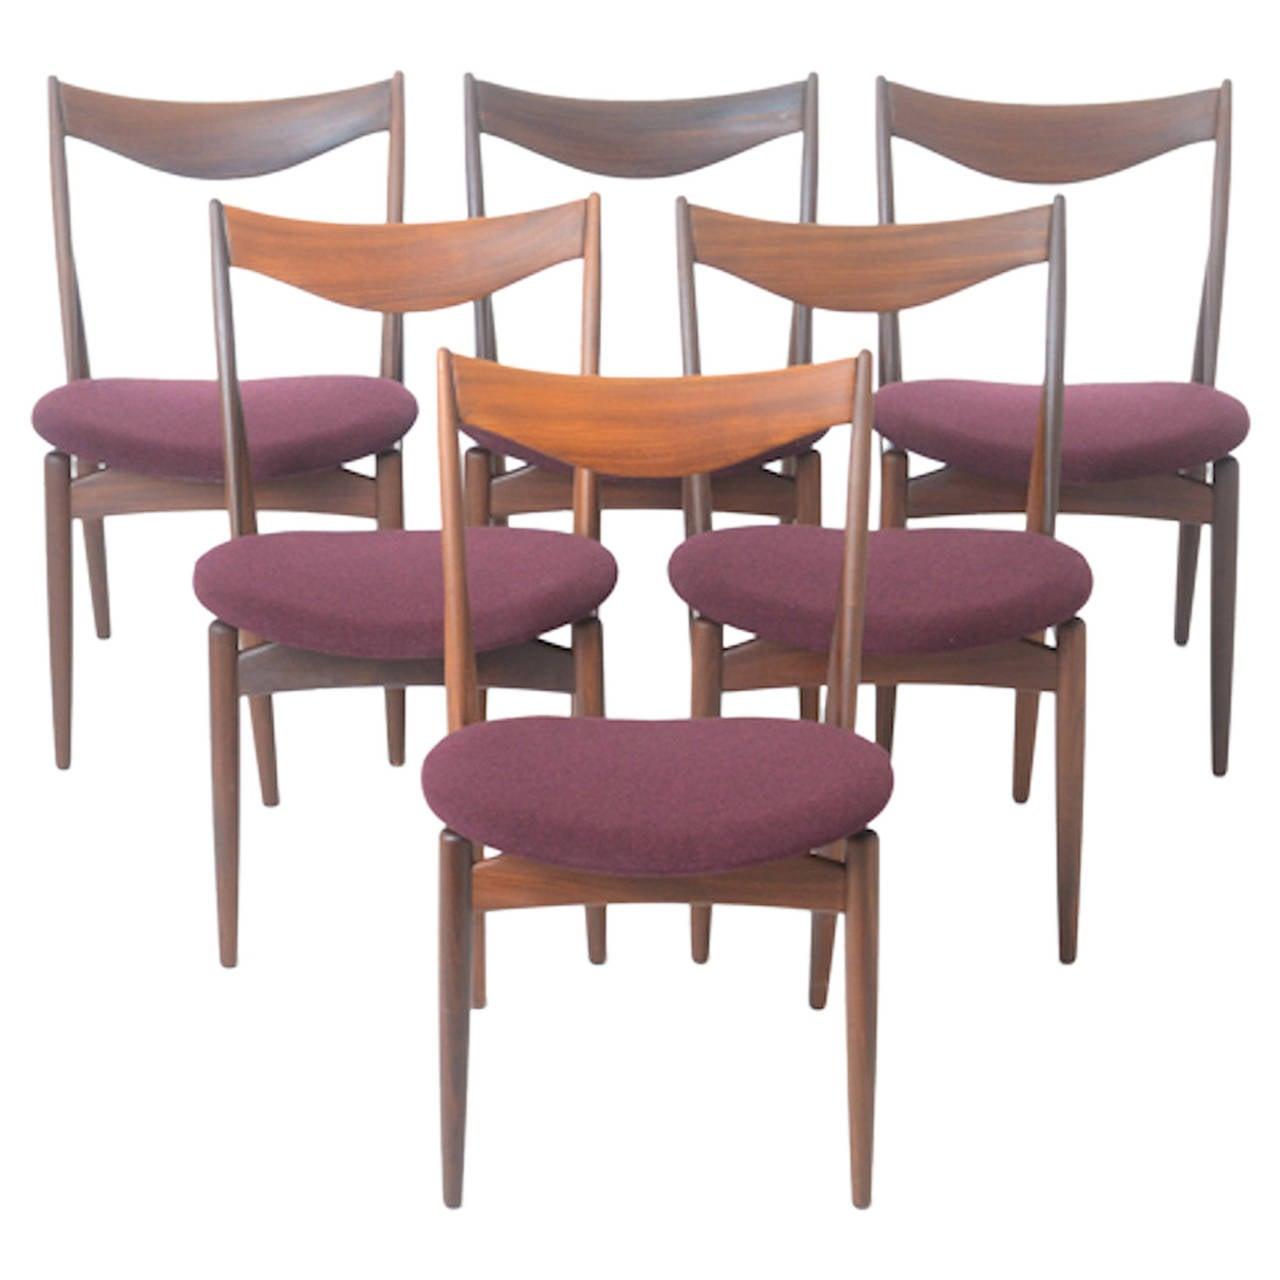 Mid century danish modern teak dining chairs in scandinavian wool set of 6 at 1stdibs - Scandinavian teak dining room furniture ...